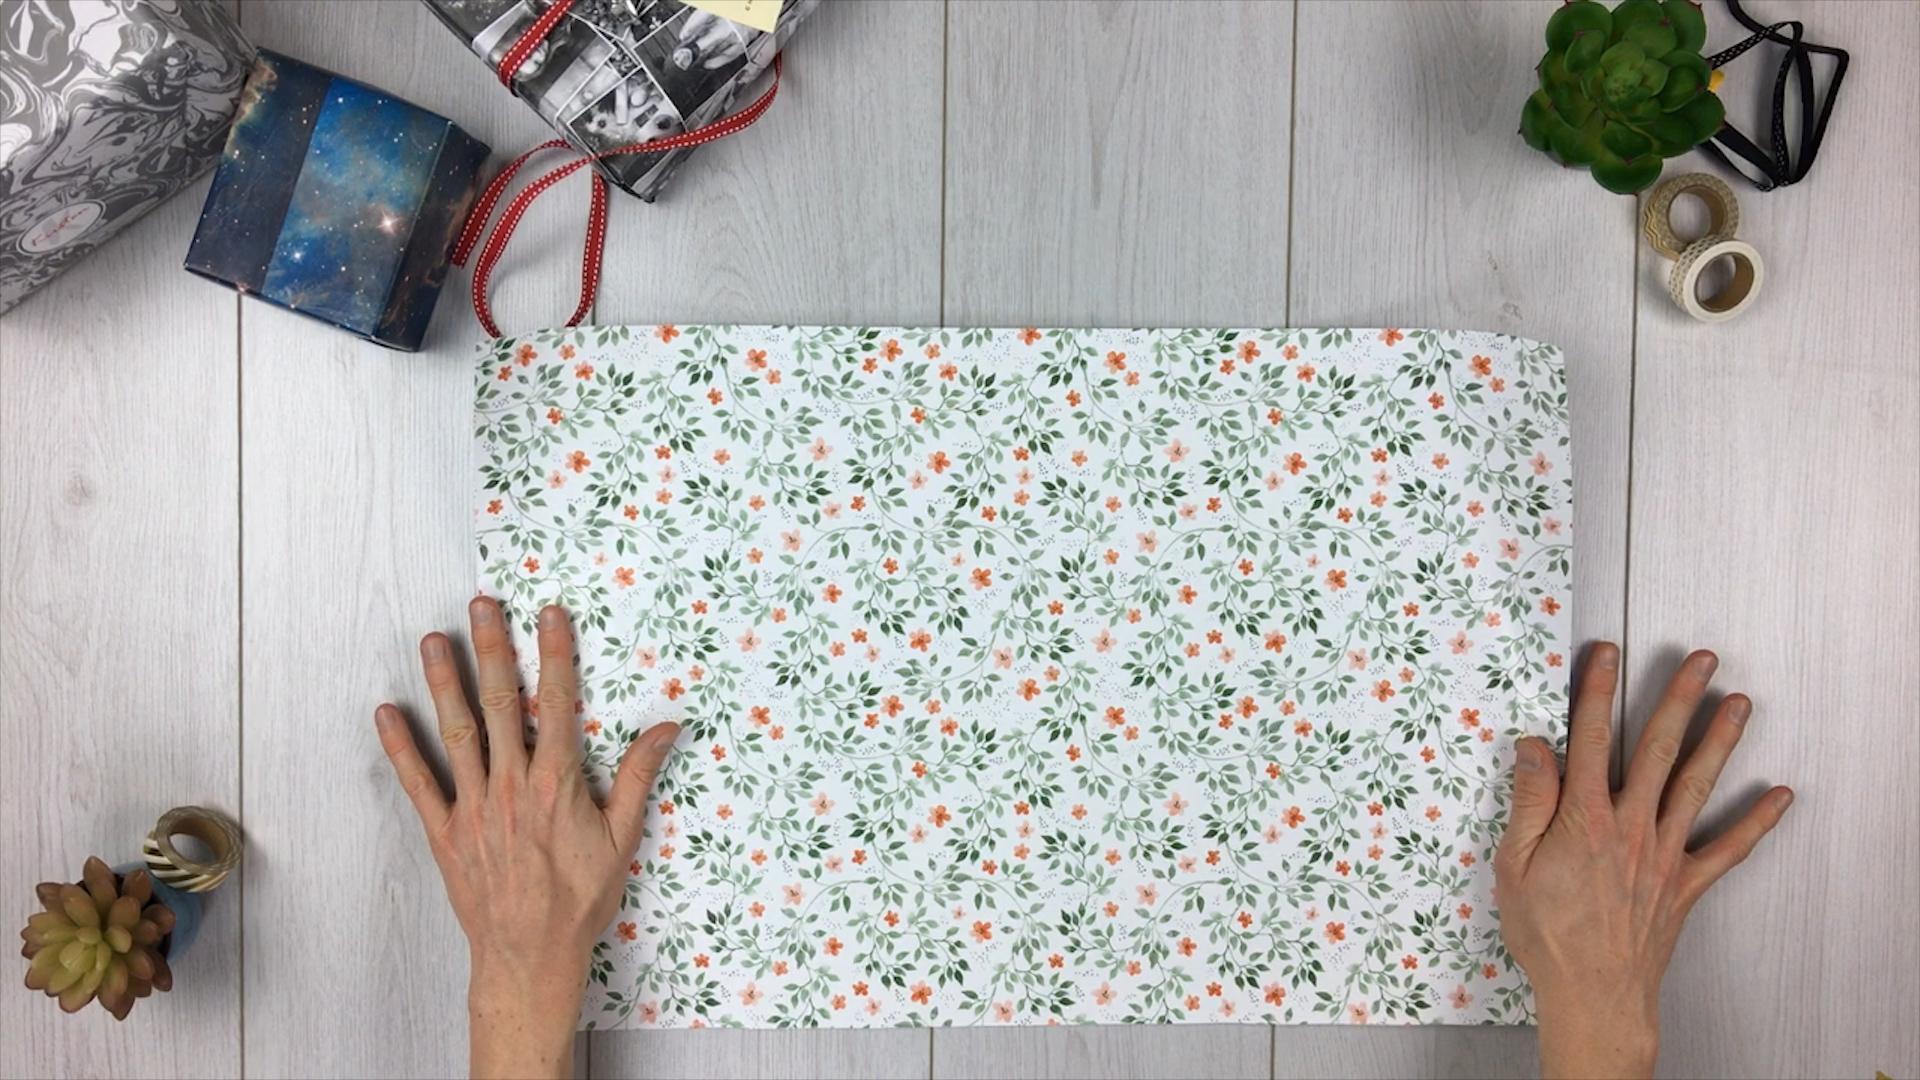 Geschenktüte basteln - Schritt 2